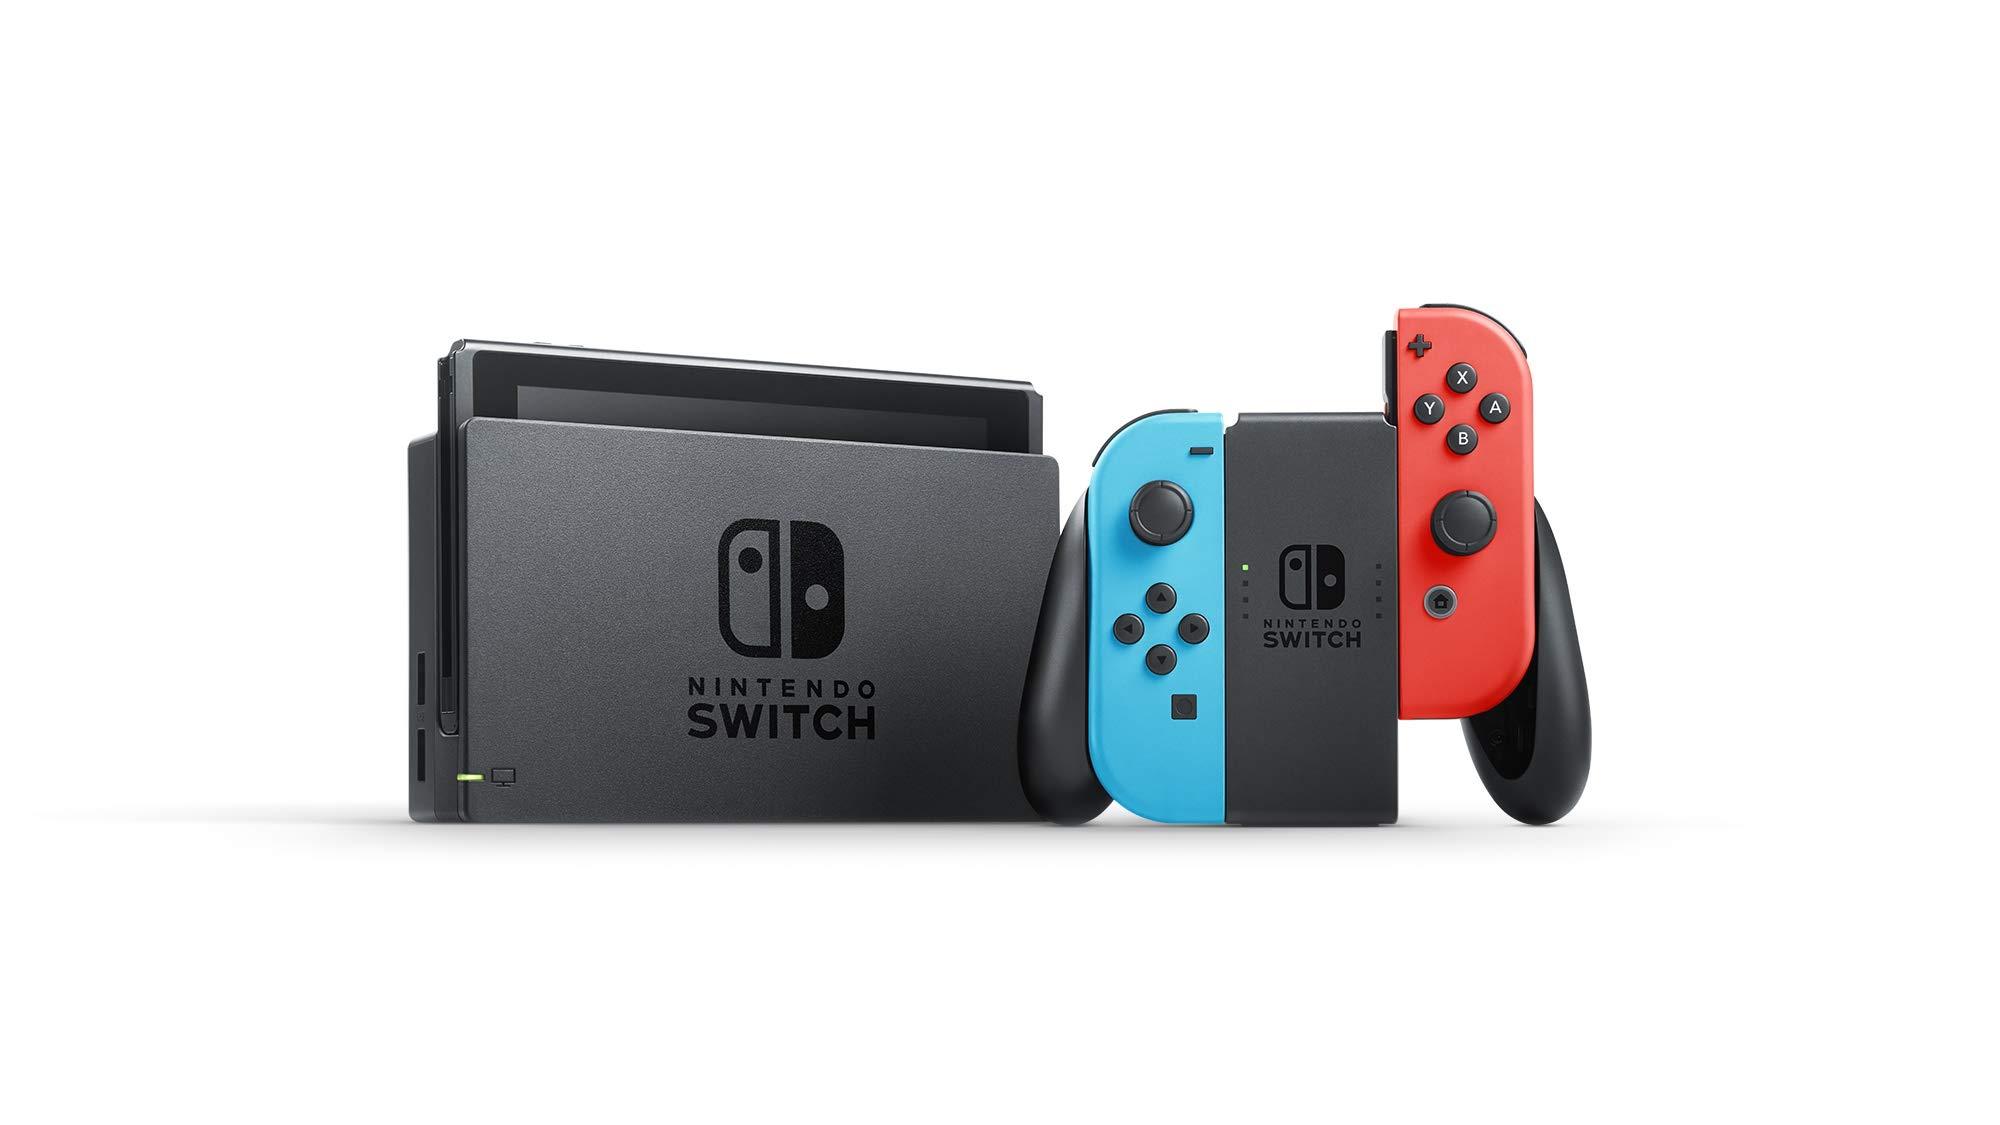 Nintendo Switch w/ Neon Blue & Neon Red Joy Con + $35 Nintendo eShop Credit Download Code - Nintendo Switch by Nintendo (Image #3)